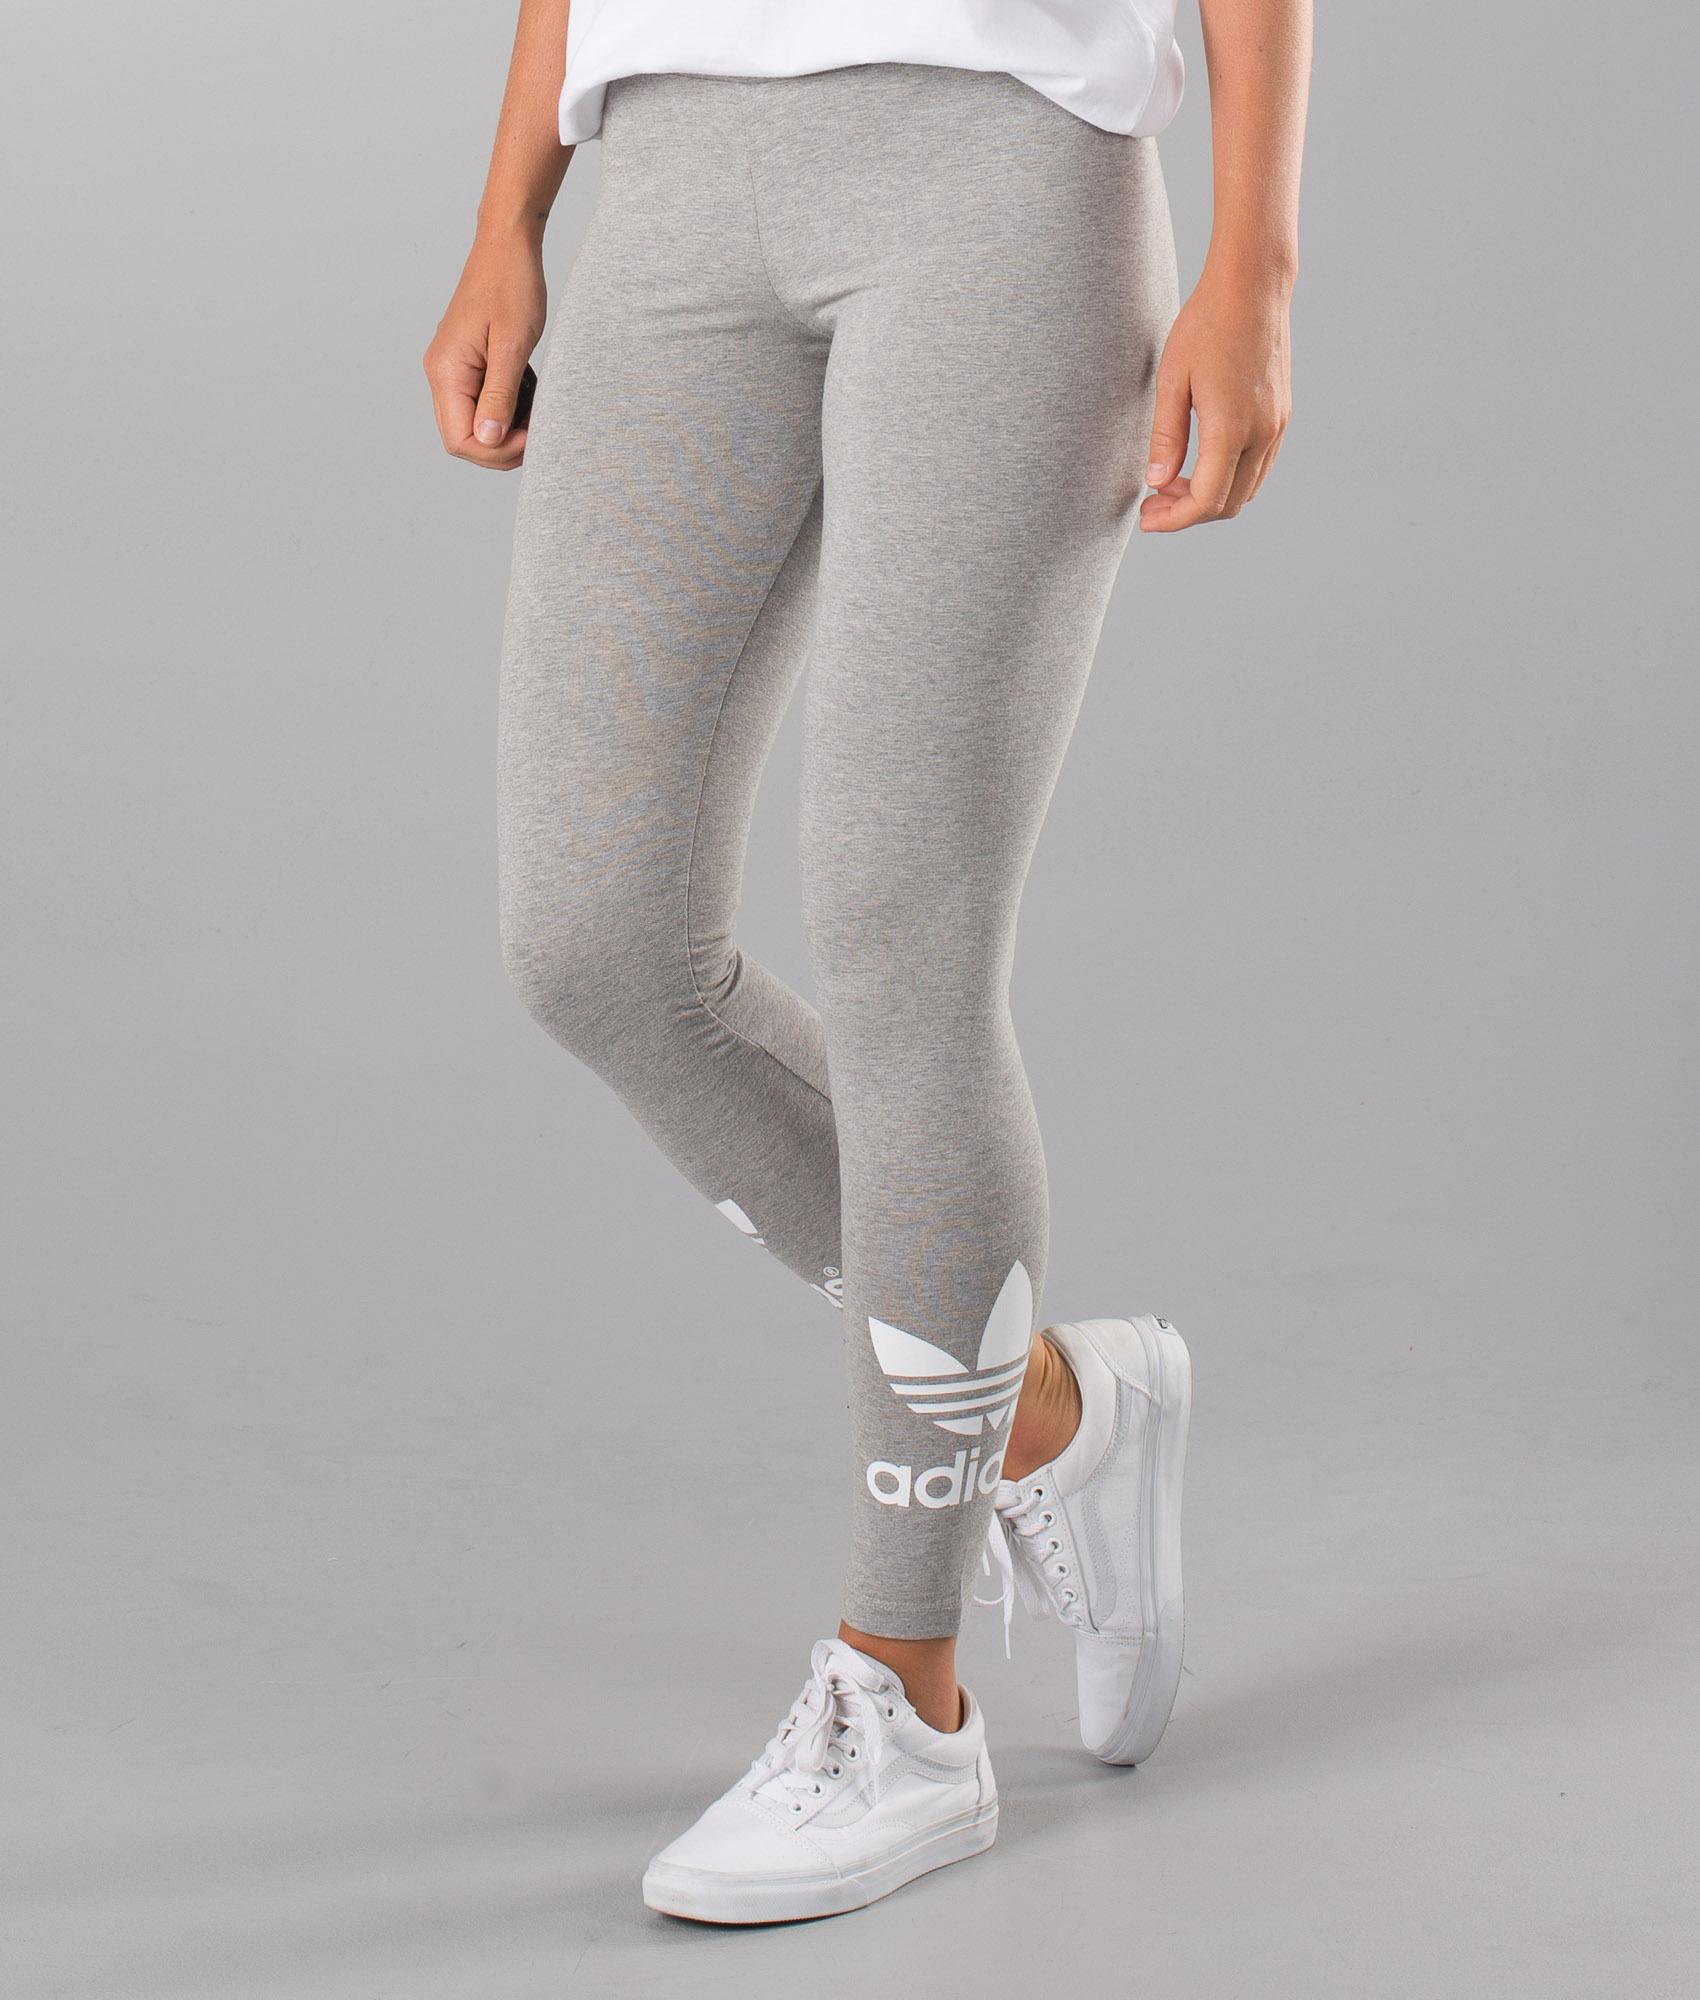 Adidas Originals Trefoil Leggings Mgreyh